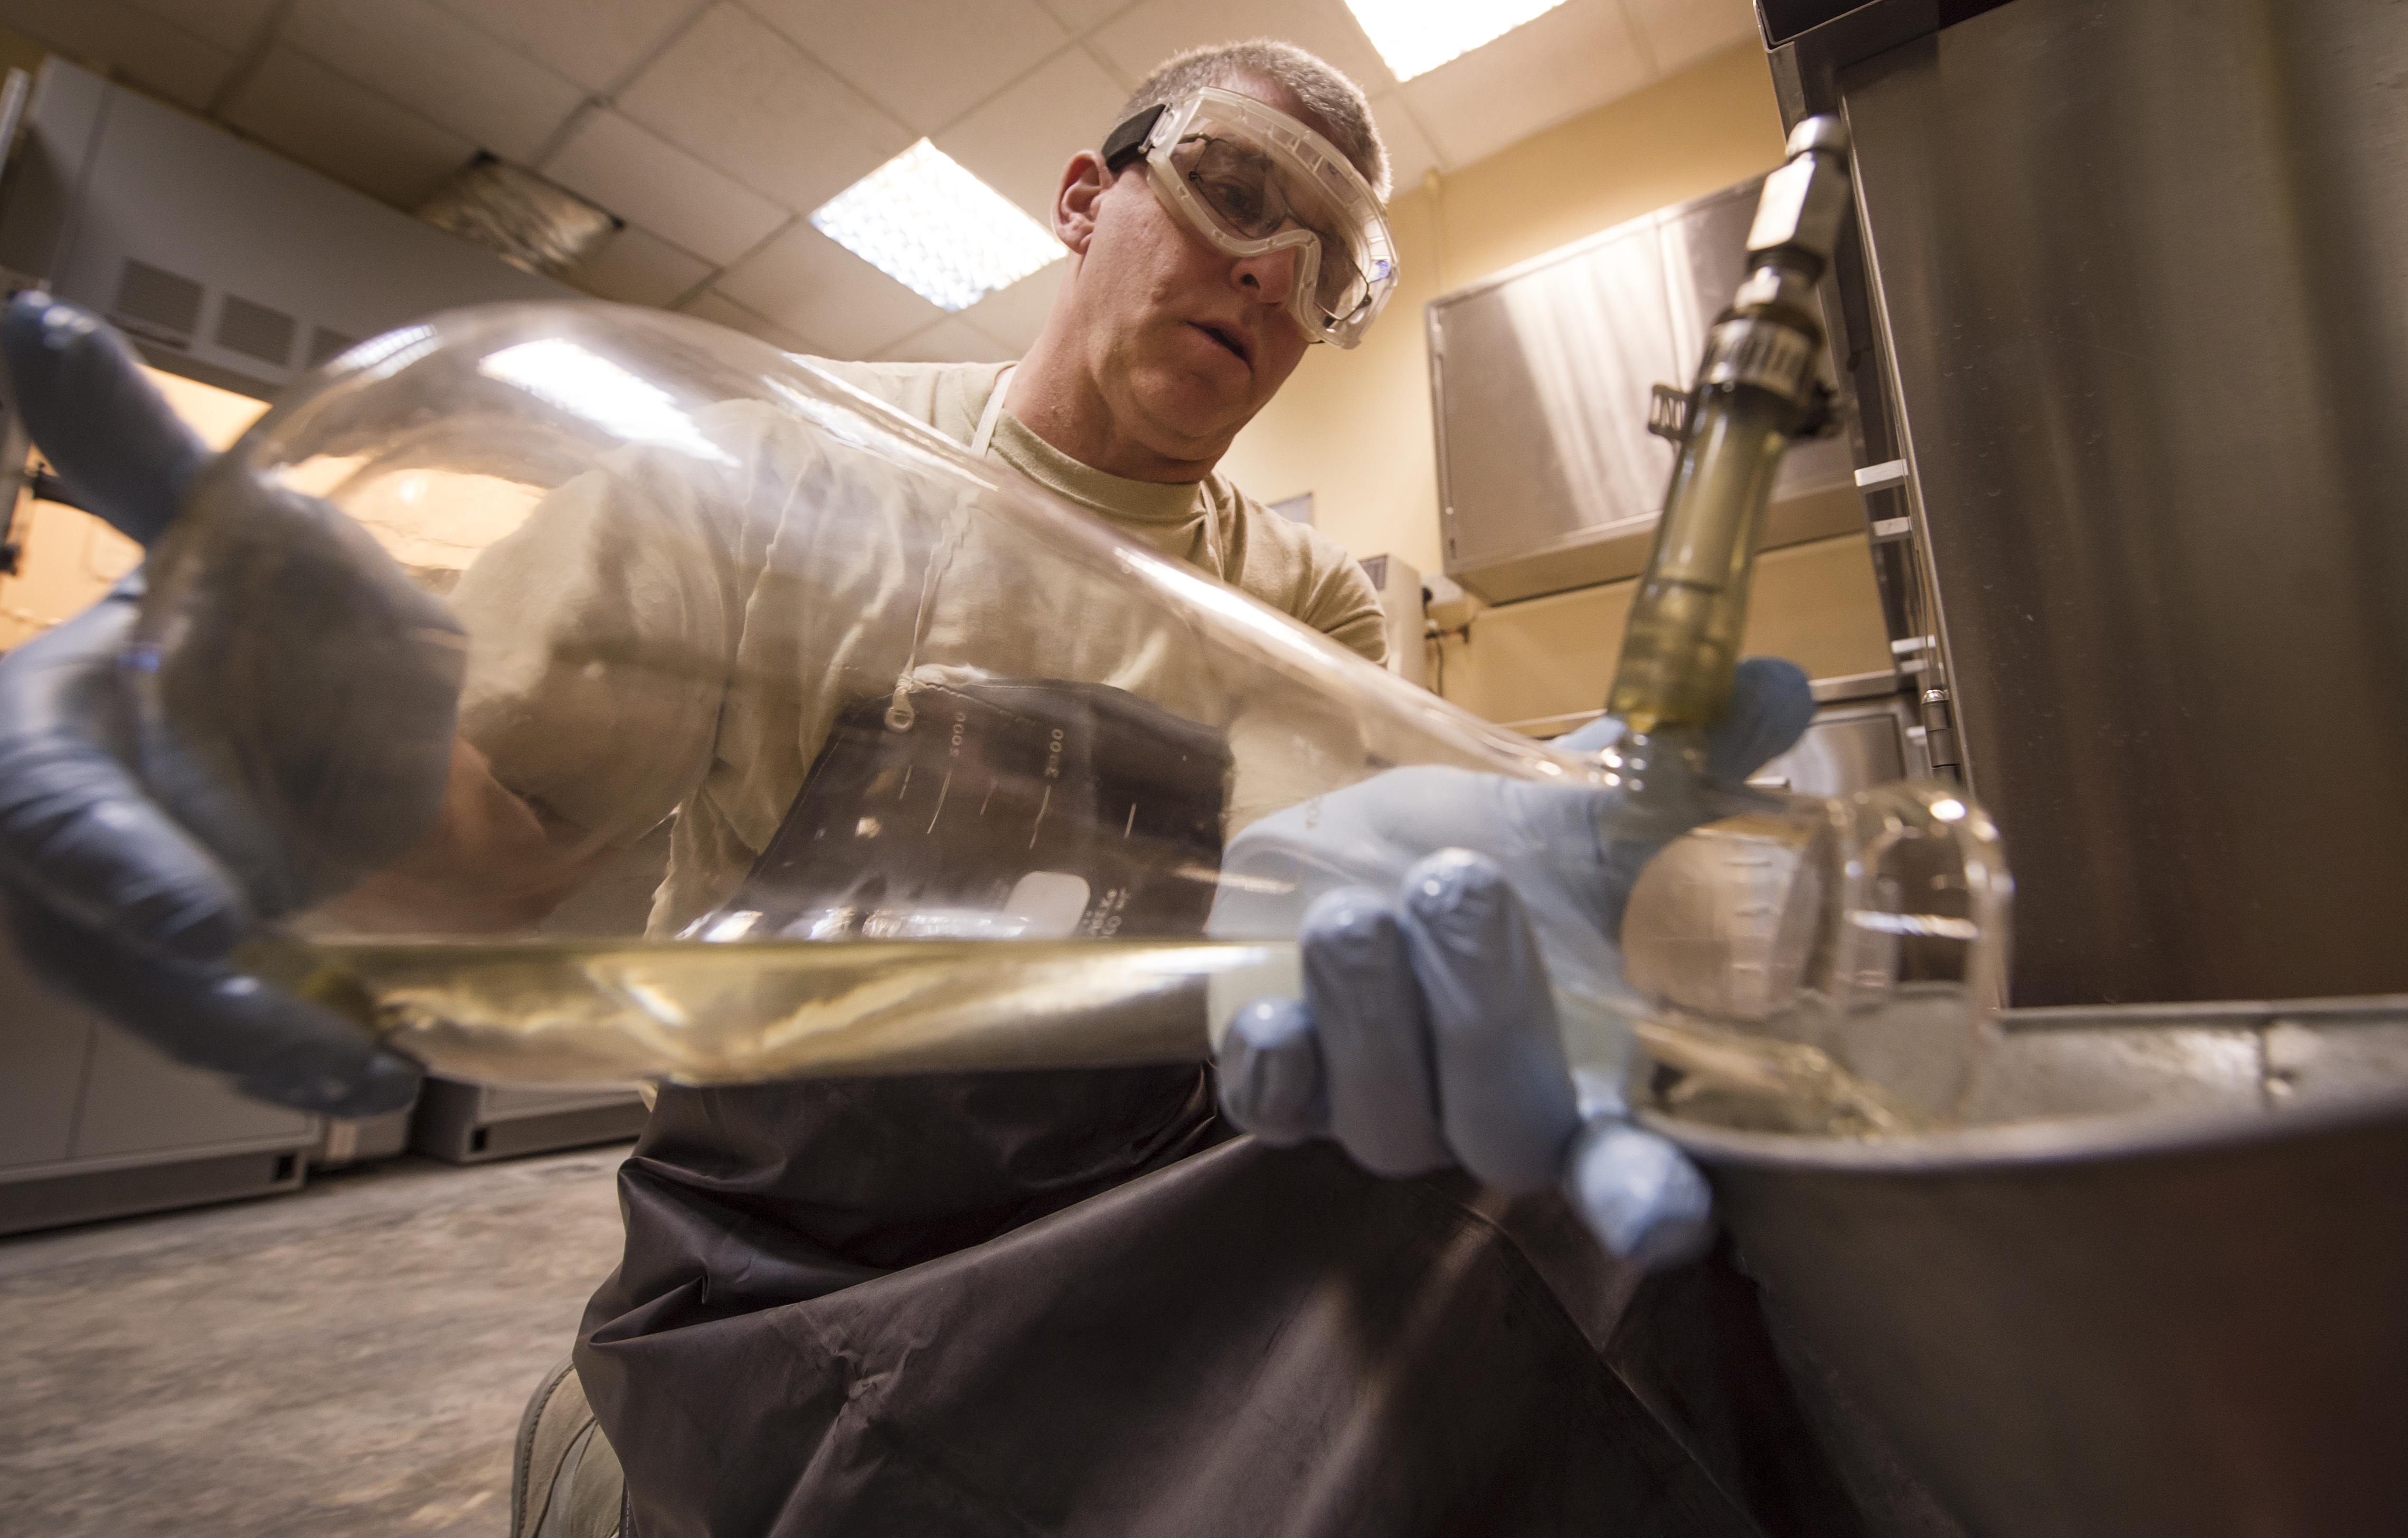 Fuels lab keeps AUAB combat ready